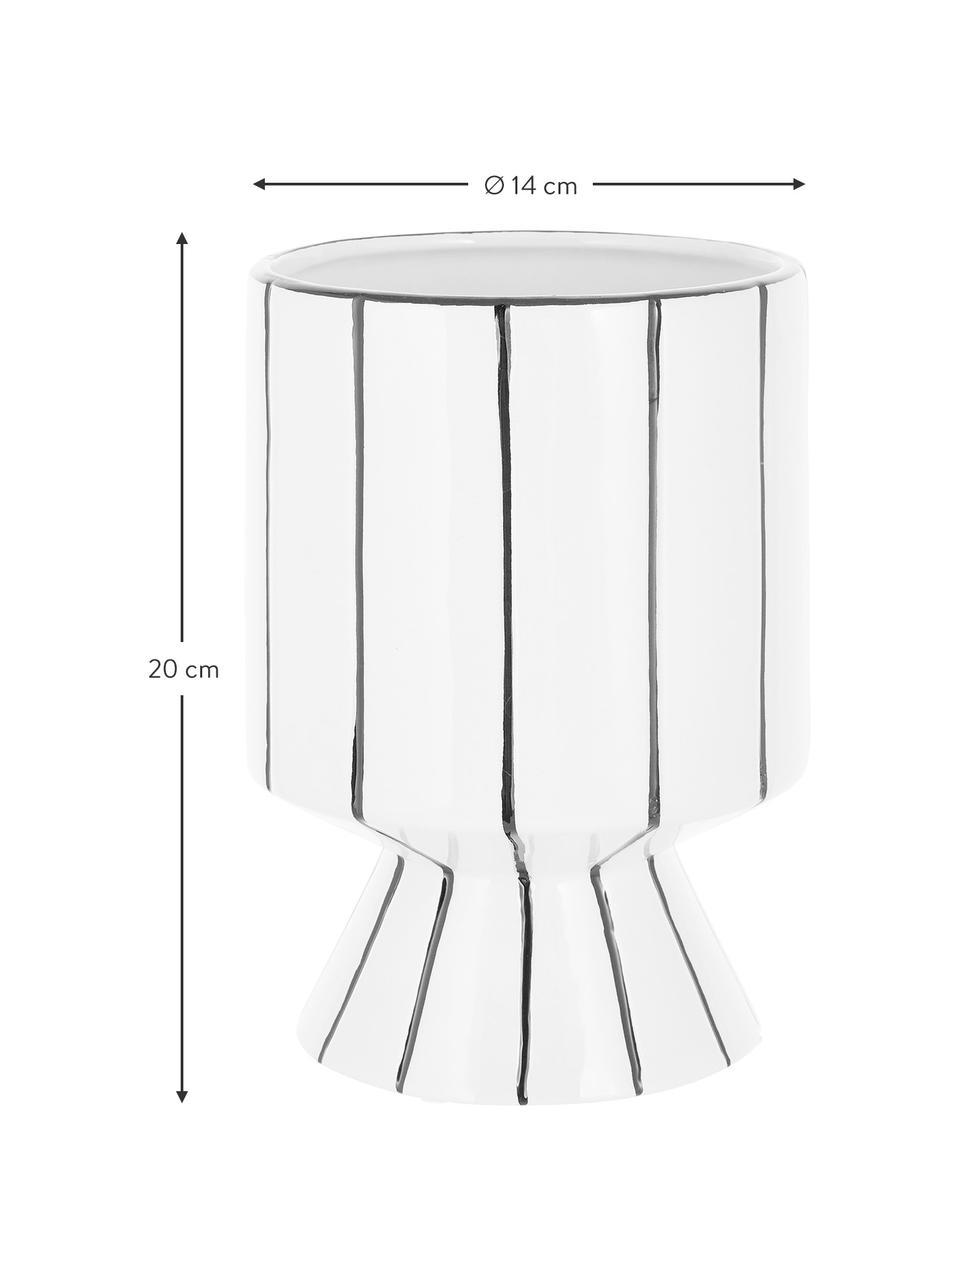 Portavaso rotondo in gres Reno, Gres, Bianco, nero, Ø 14 x Alt. 20 cm